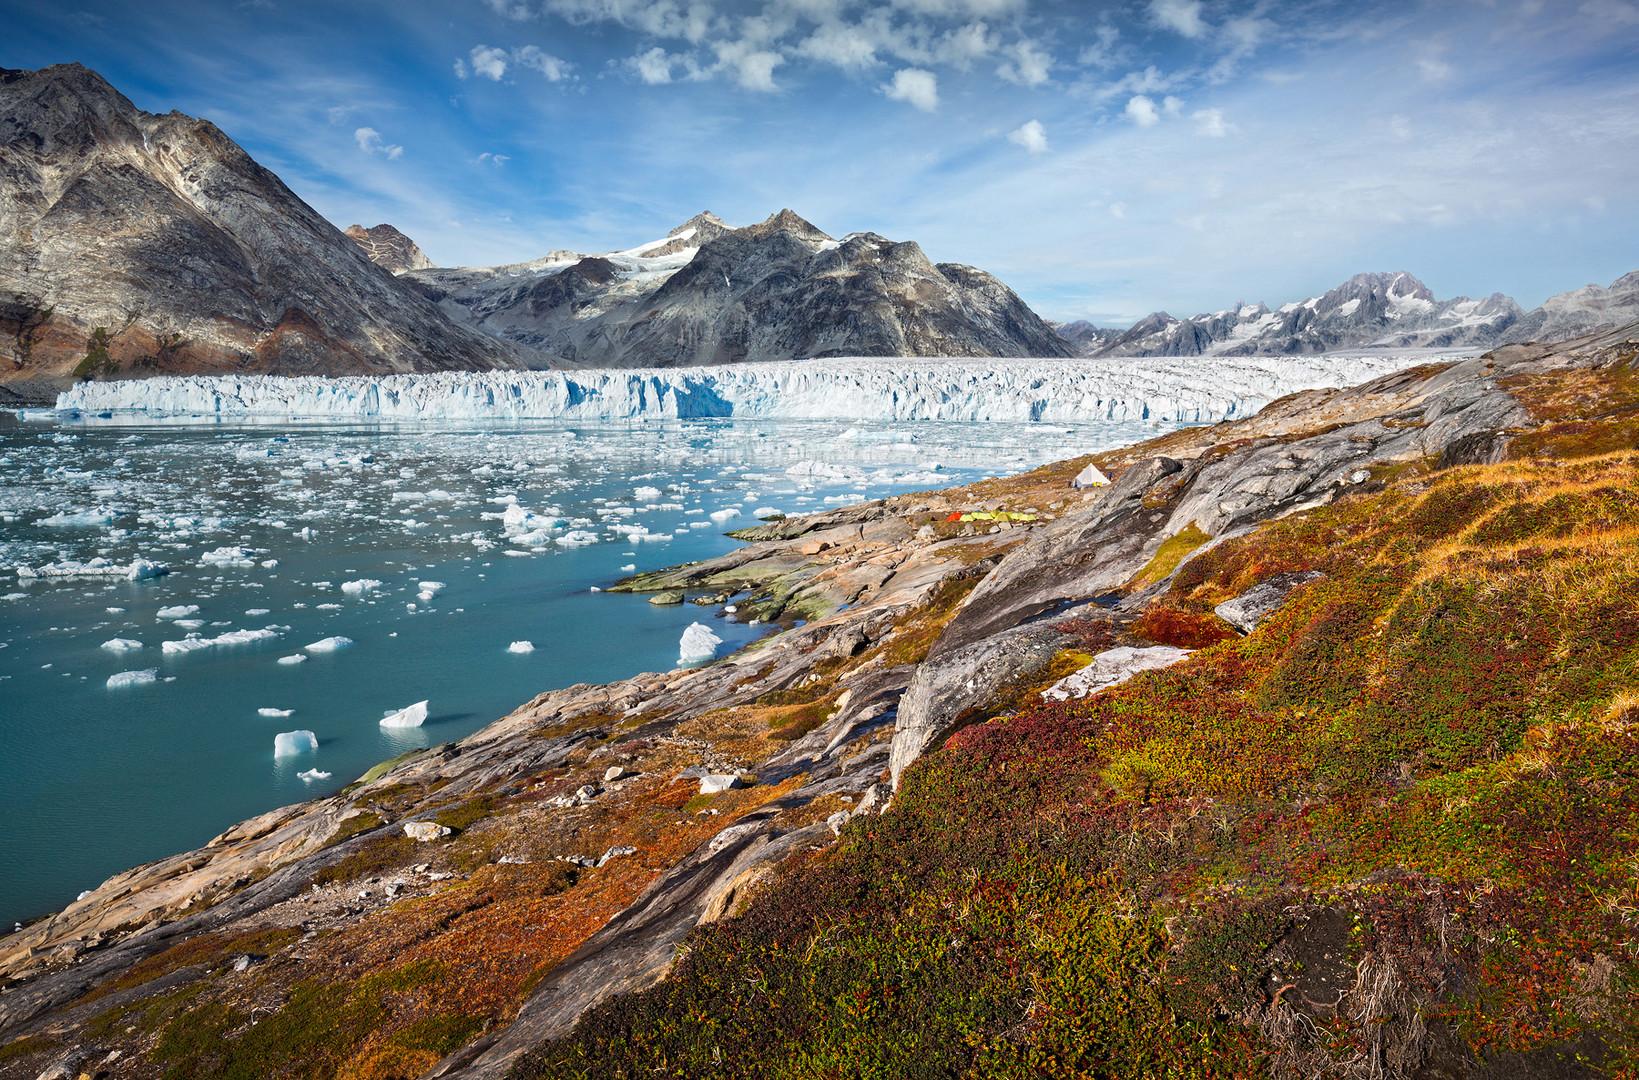 Camp am Gletscher